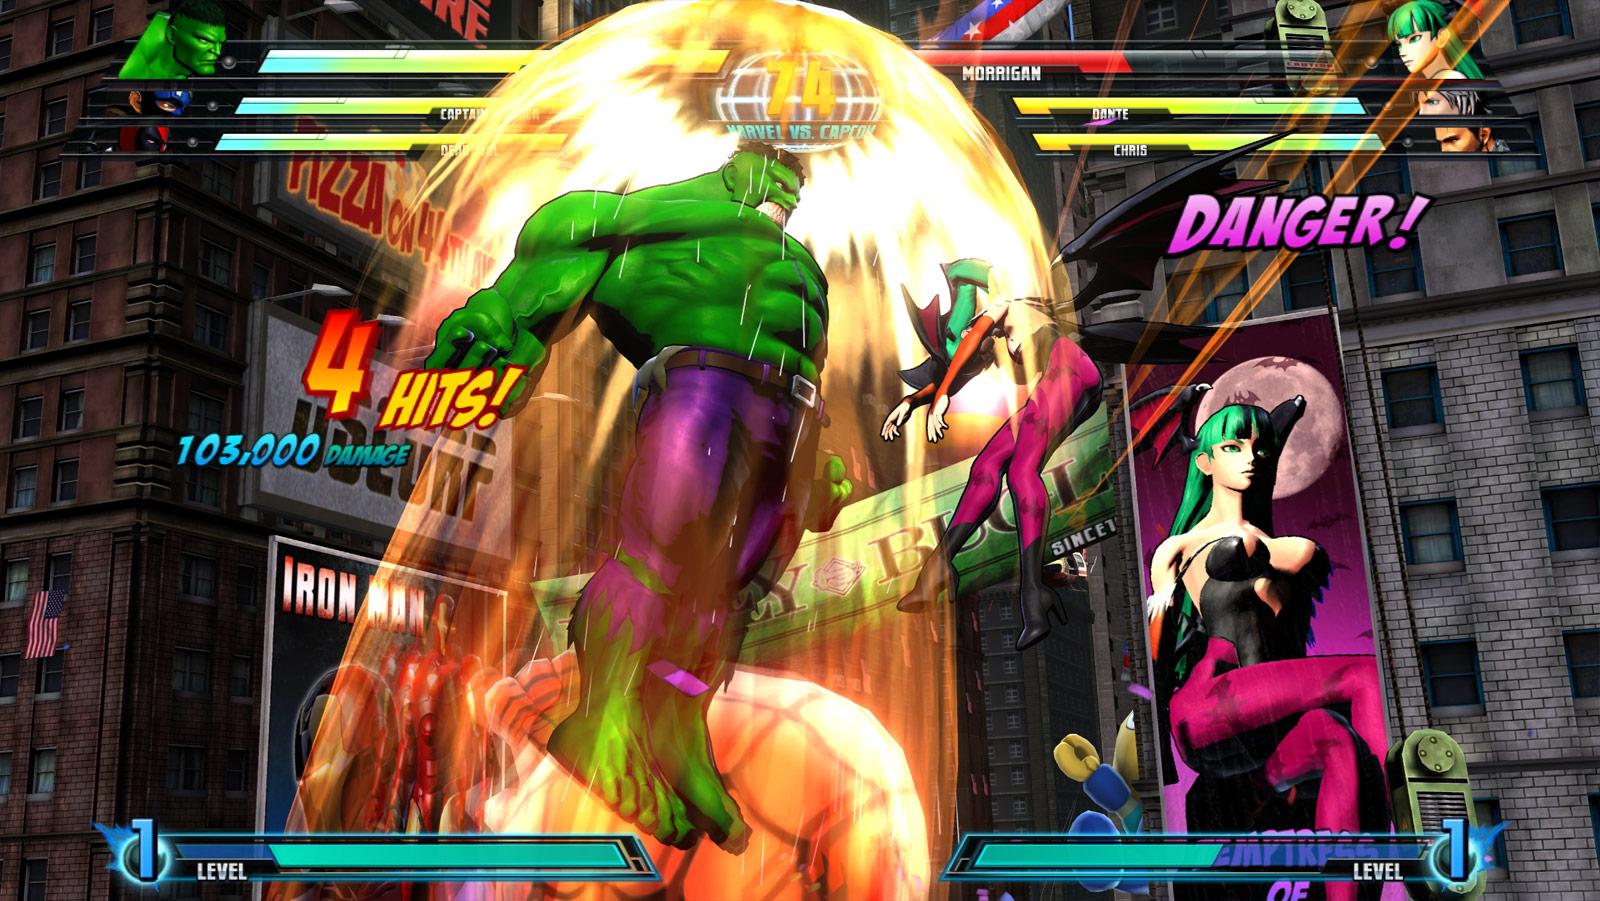 Marvel vs. Capcom 3 screen shot from E3 image #8